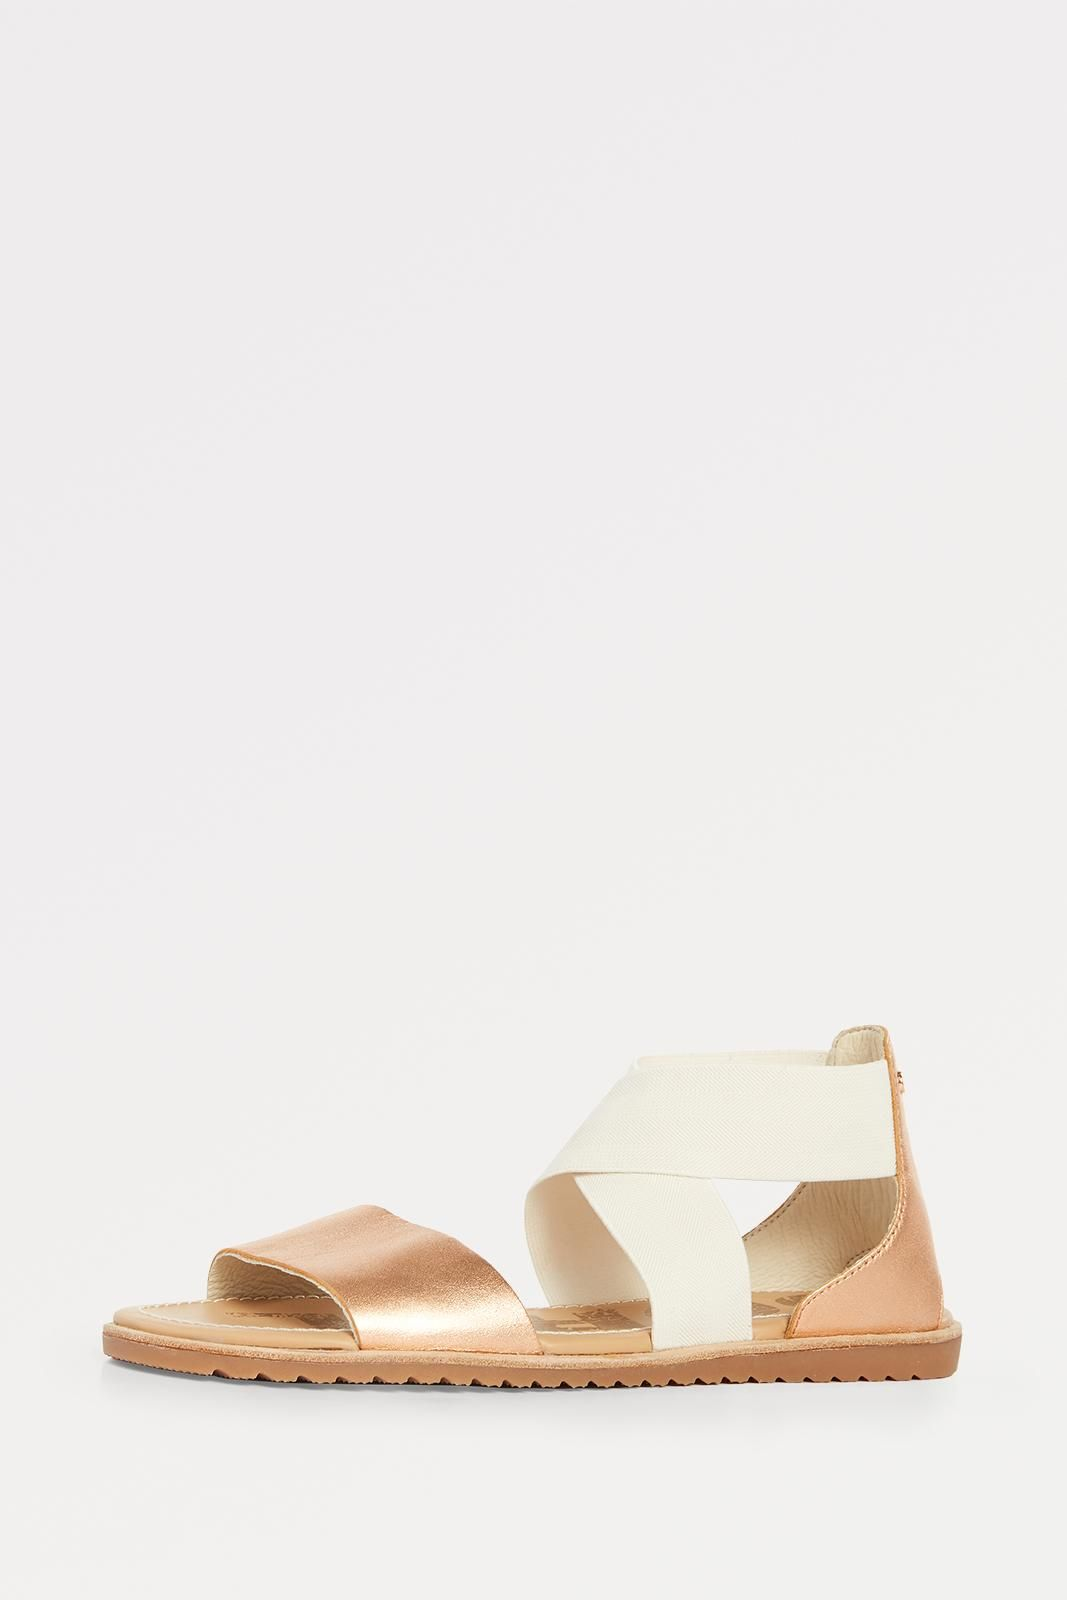 72daae11177 SOREL Ella Sandal Cute Sandals